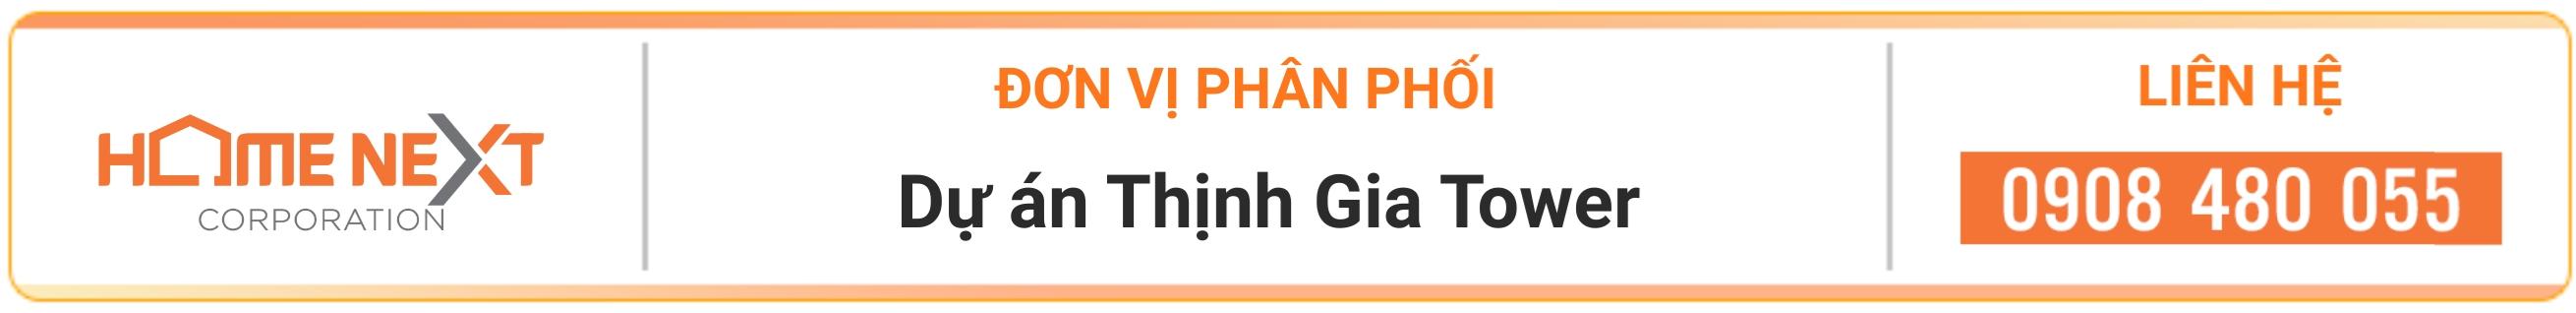 banner-phan-phoi-thinh-gia